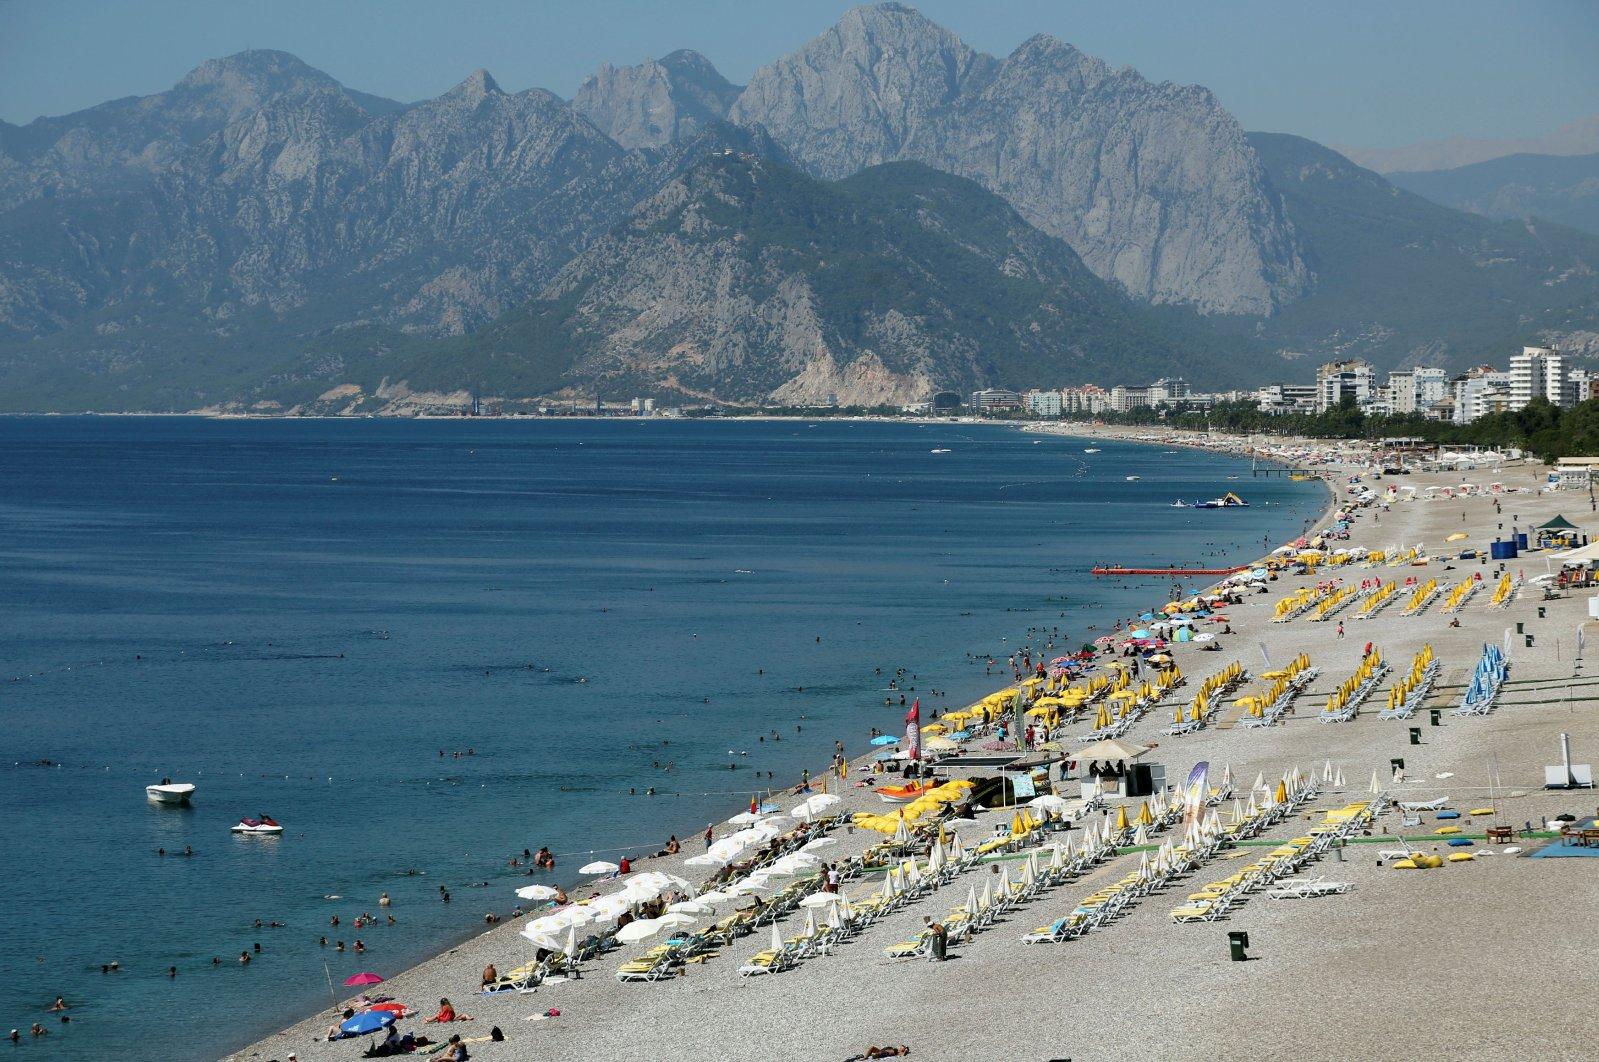 Tourists enjoy a beach in the Mediterranean resort city of Antalya, a popular destination for tourists, Turkey, July 25, 2016. (Reuters Photo)